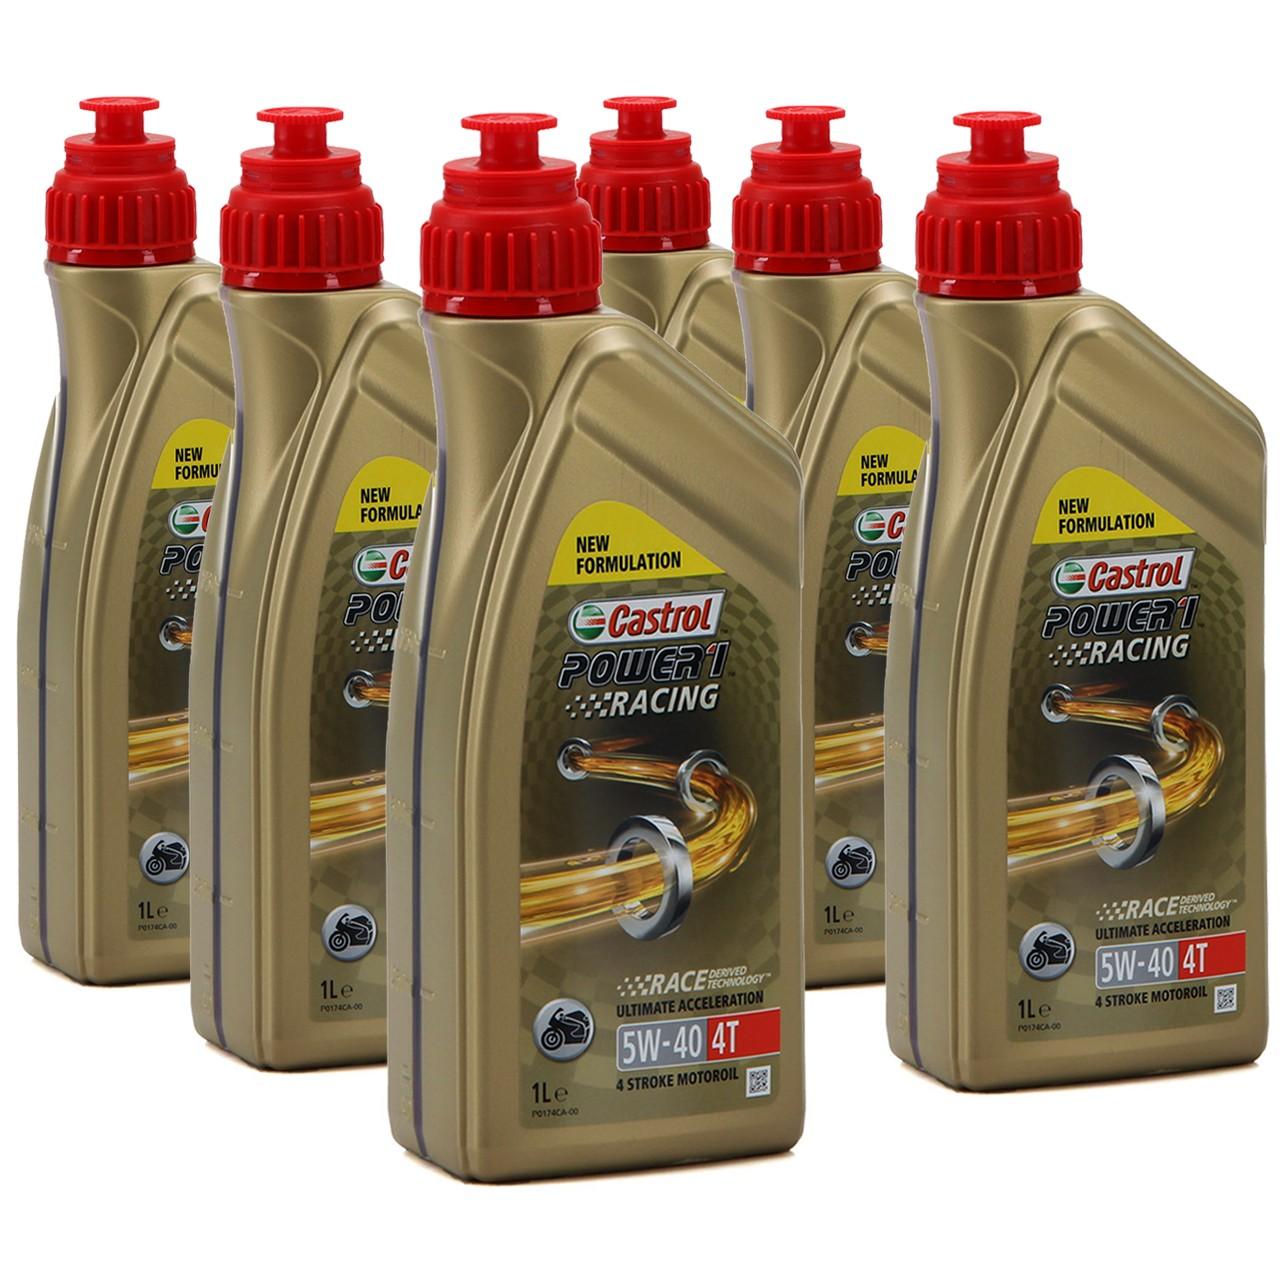 CASTROL MOTORRAD Motoröl Öl POWER 1 RACING 4T 5W-40 JASO MA-2 - 6L 6 Liter